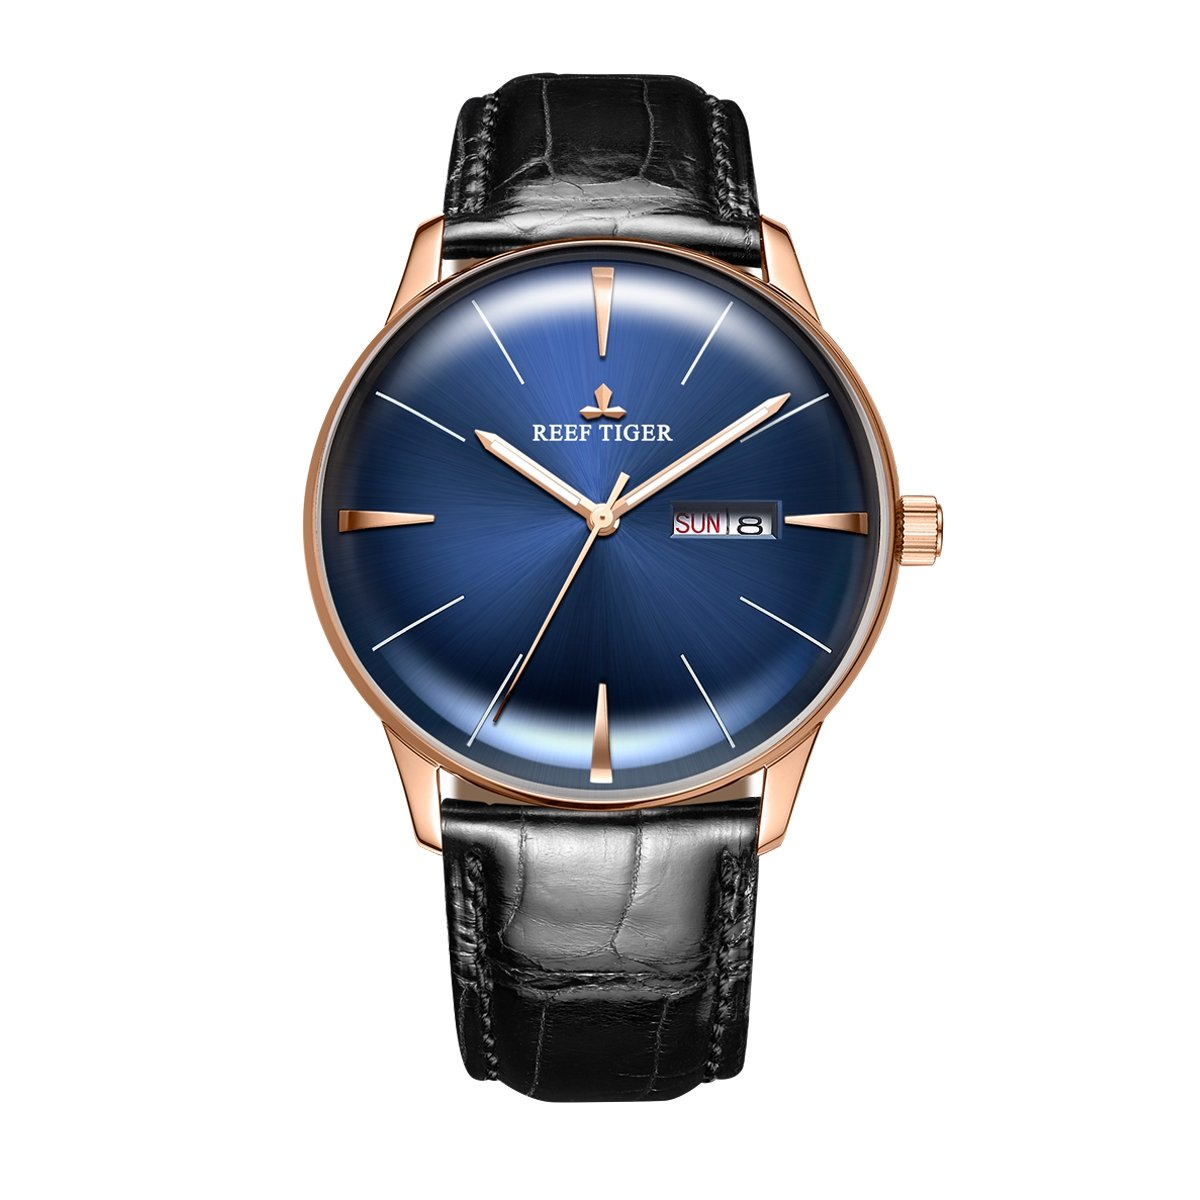 Reef Tiger Luxury Simple Watchesアナログ自動ブルーダイヤルWatches with Date Day rga8238 RGA8238-PLB B07D4BJ29R RGA8238-PLB RGA8238PLB